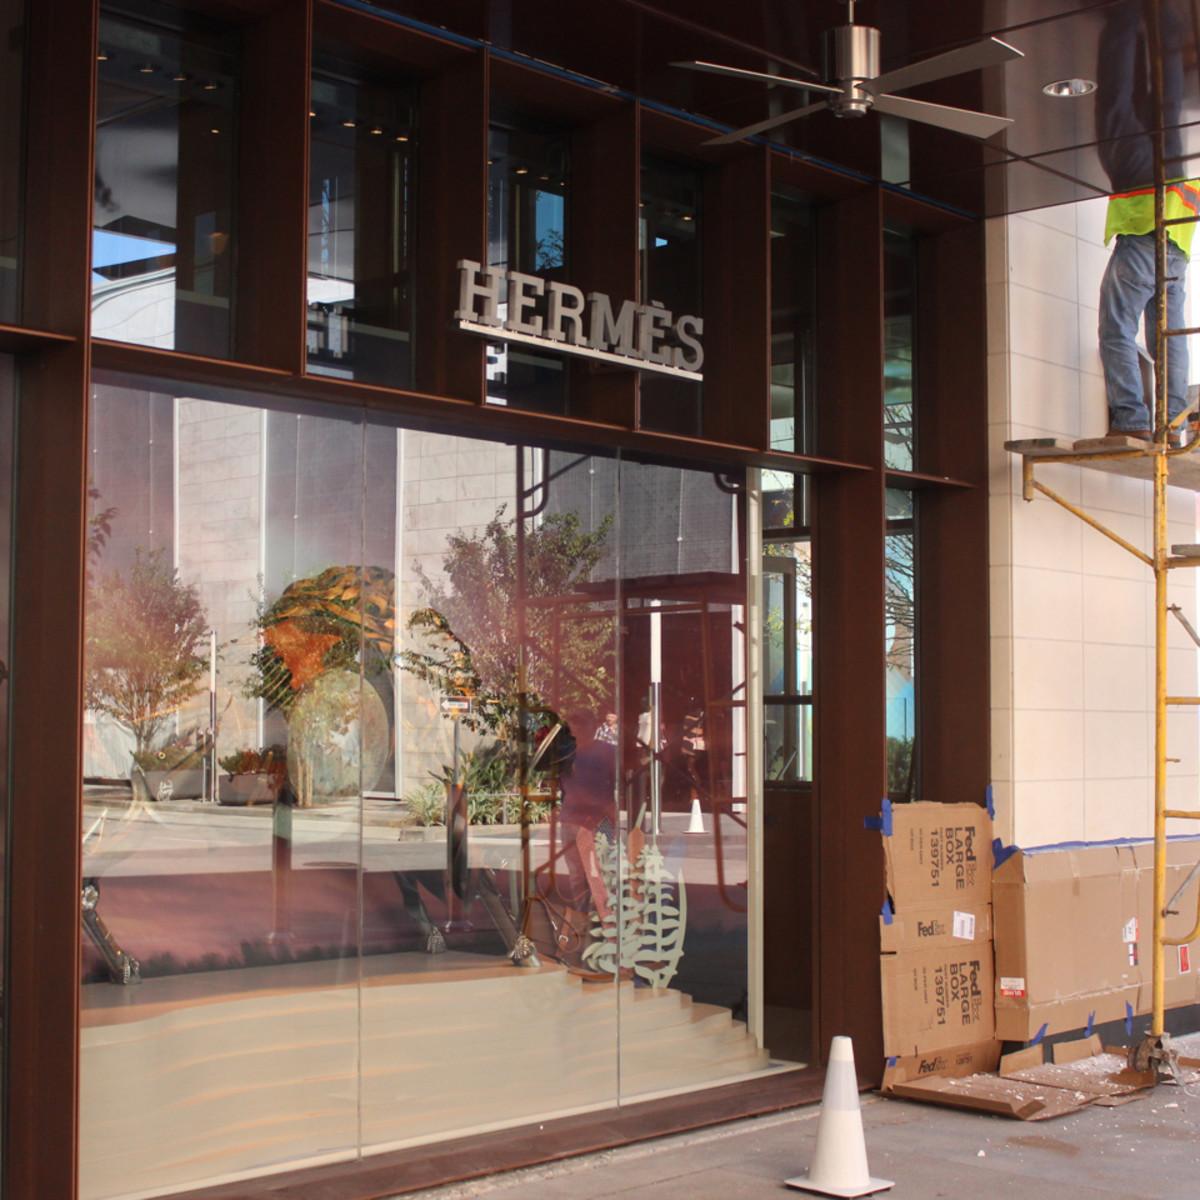 Hermes exterior under construction River Oaks District